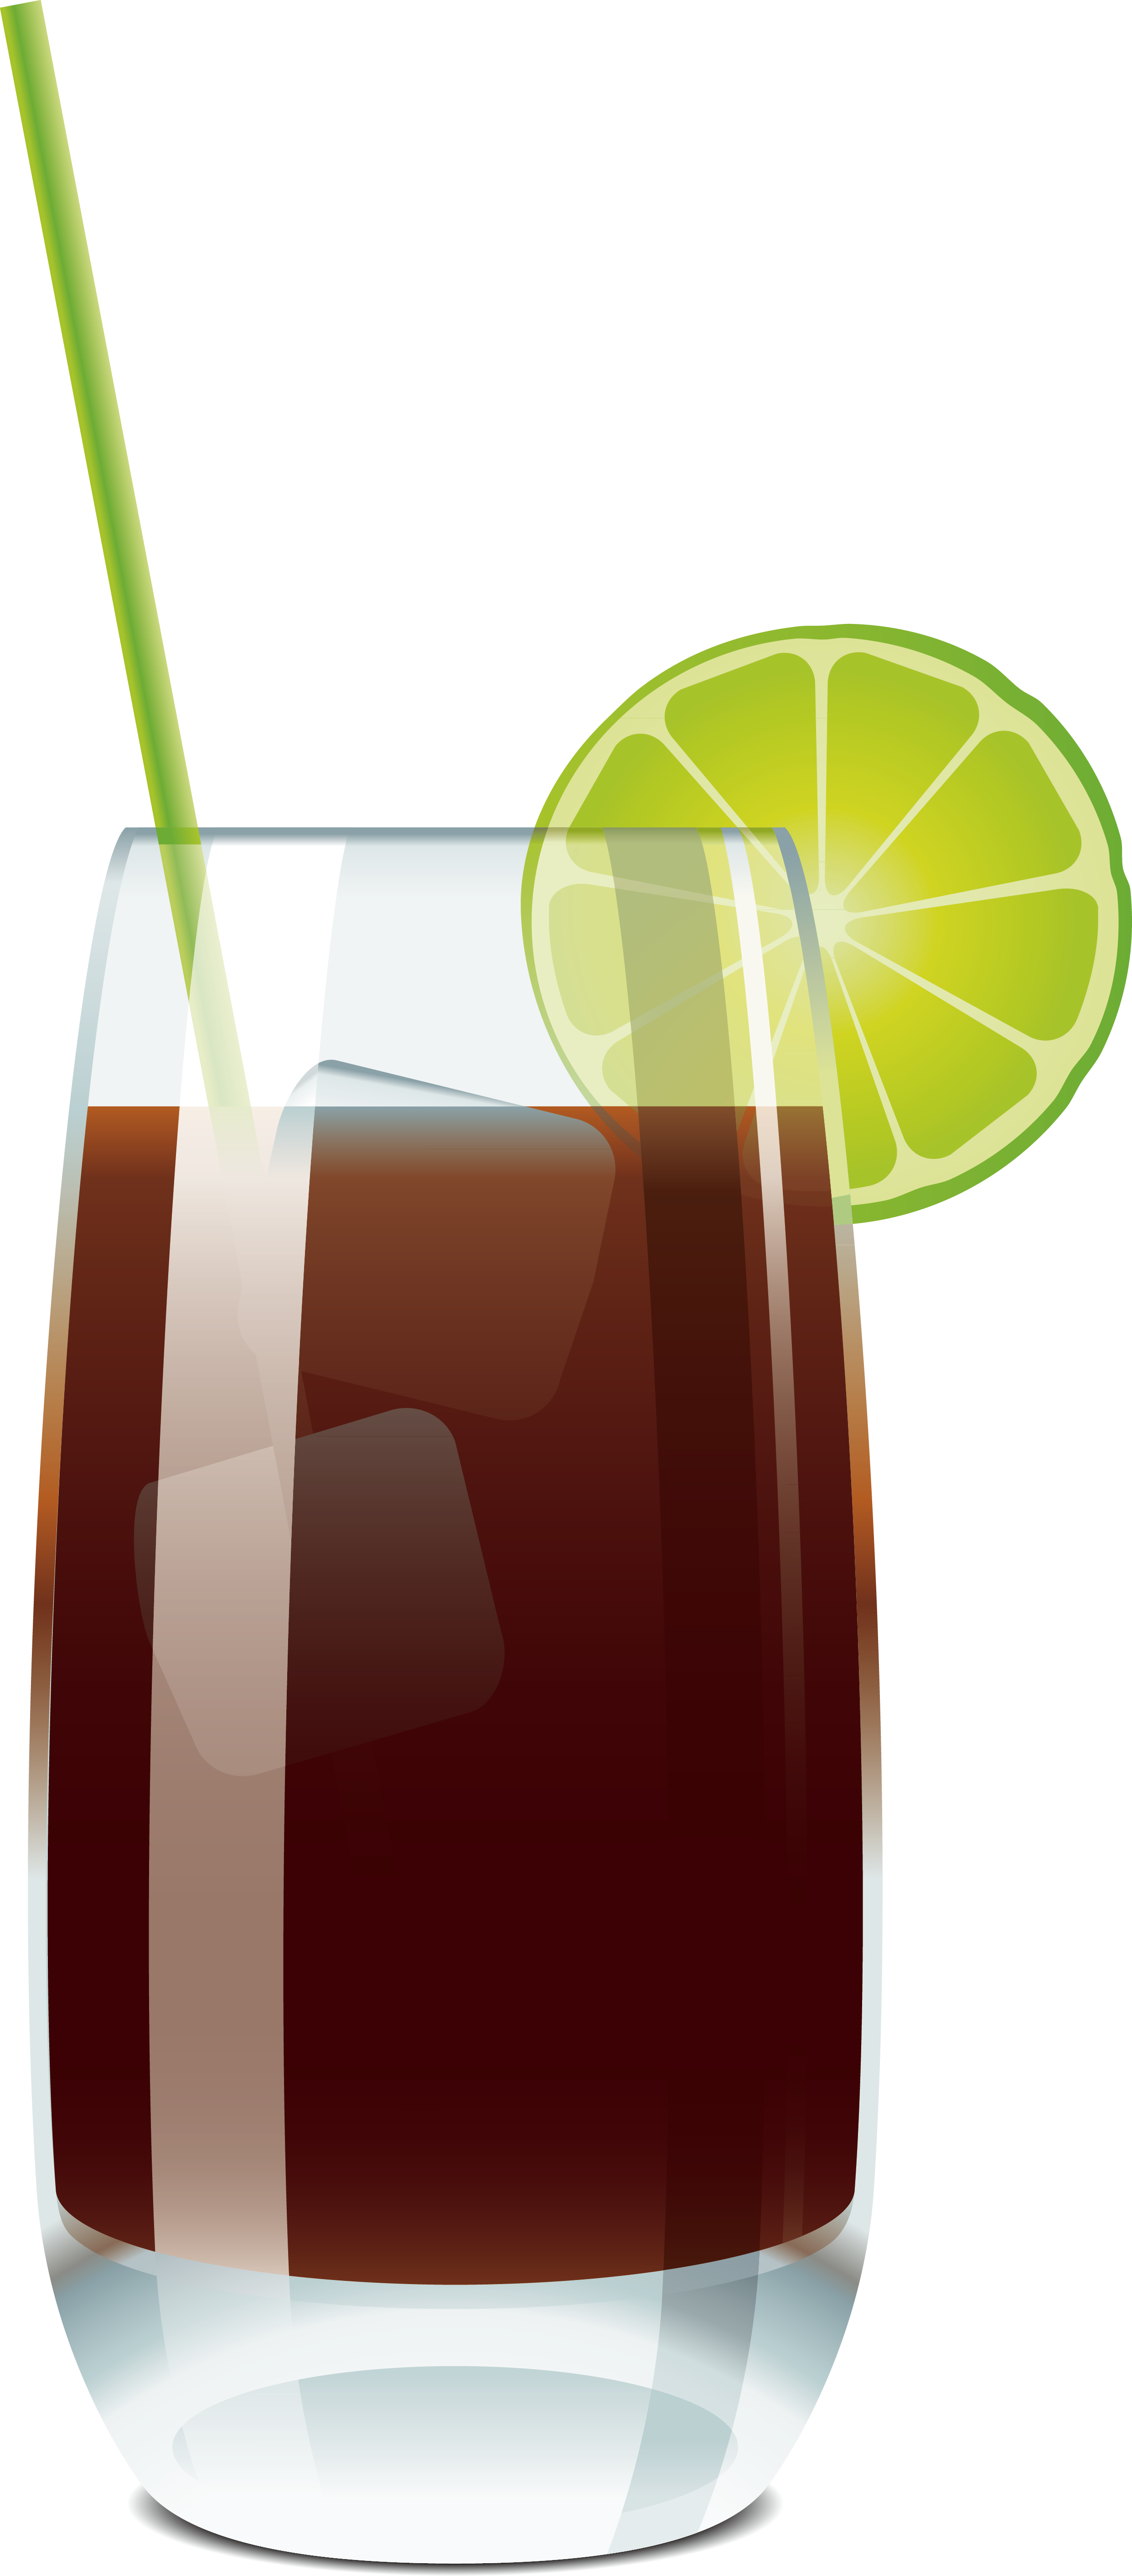 Cocktail clipart juice. Ice cream martini vodka